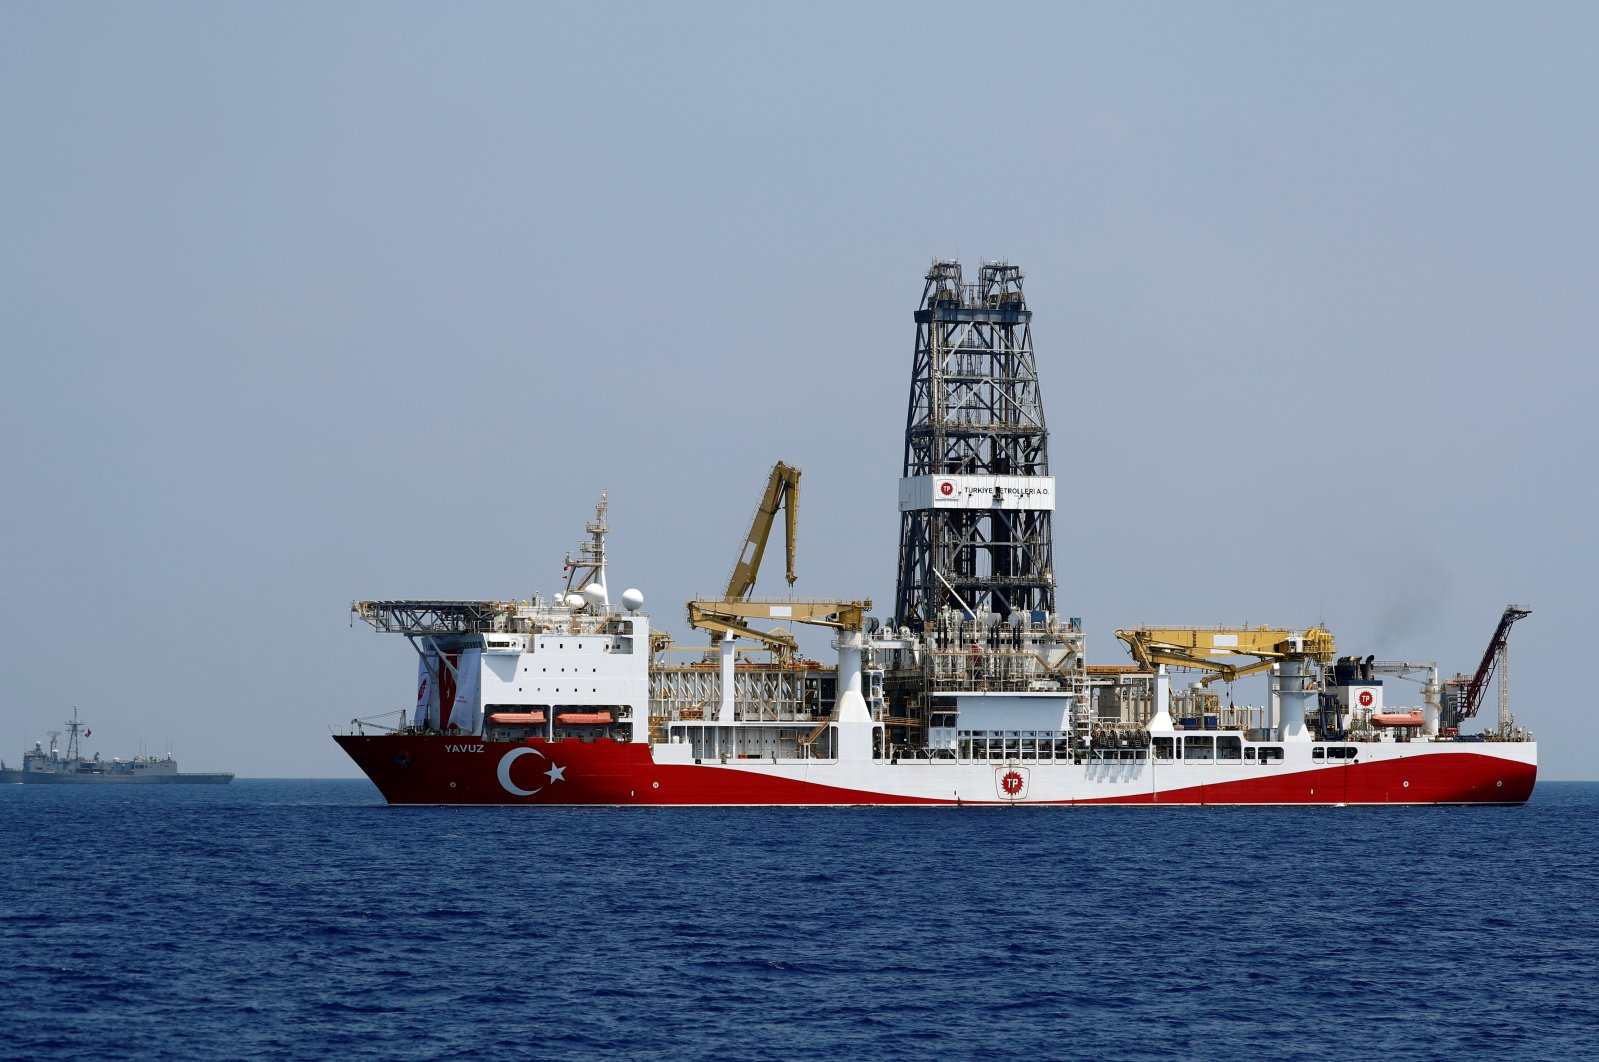 Turkish drilling vessel Yavuz is escorted by Turkish Navy frigate TCG Gemlik (F-492) in the eastern Mediterranean Sea off Cyprus, Aug. 6, 2019. (REUTERS)